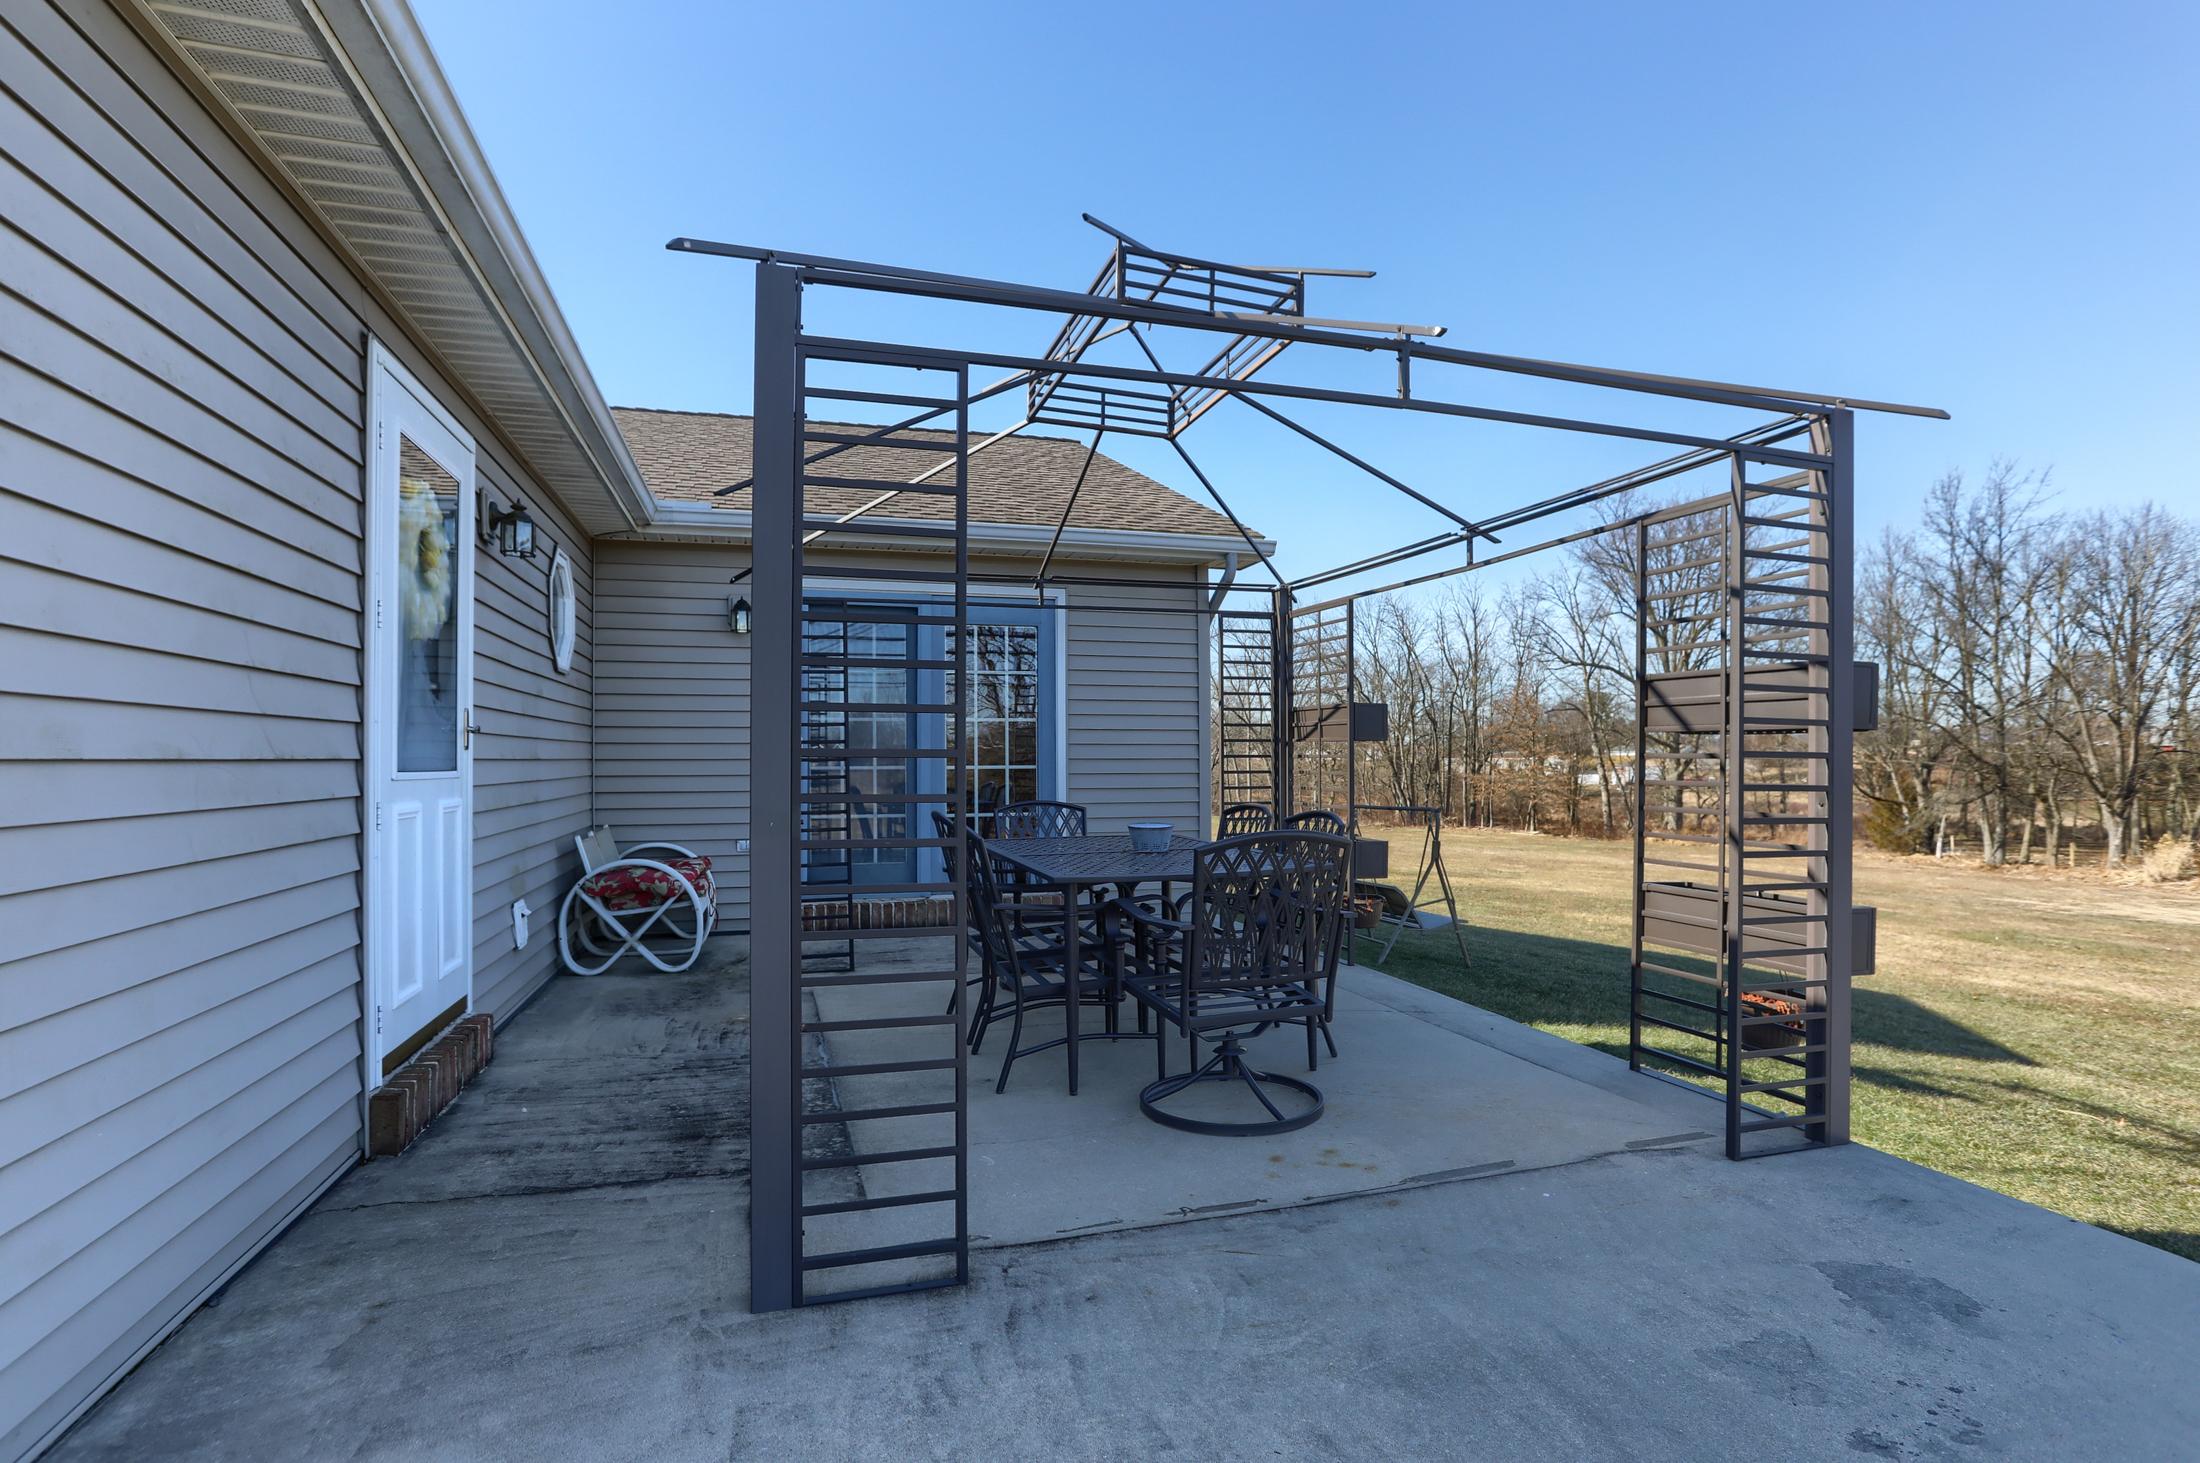 26 W. Strack Drive - patio